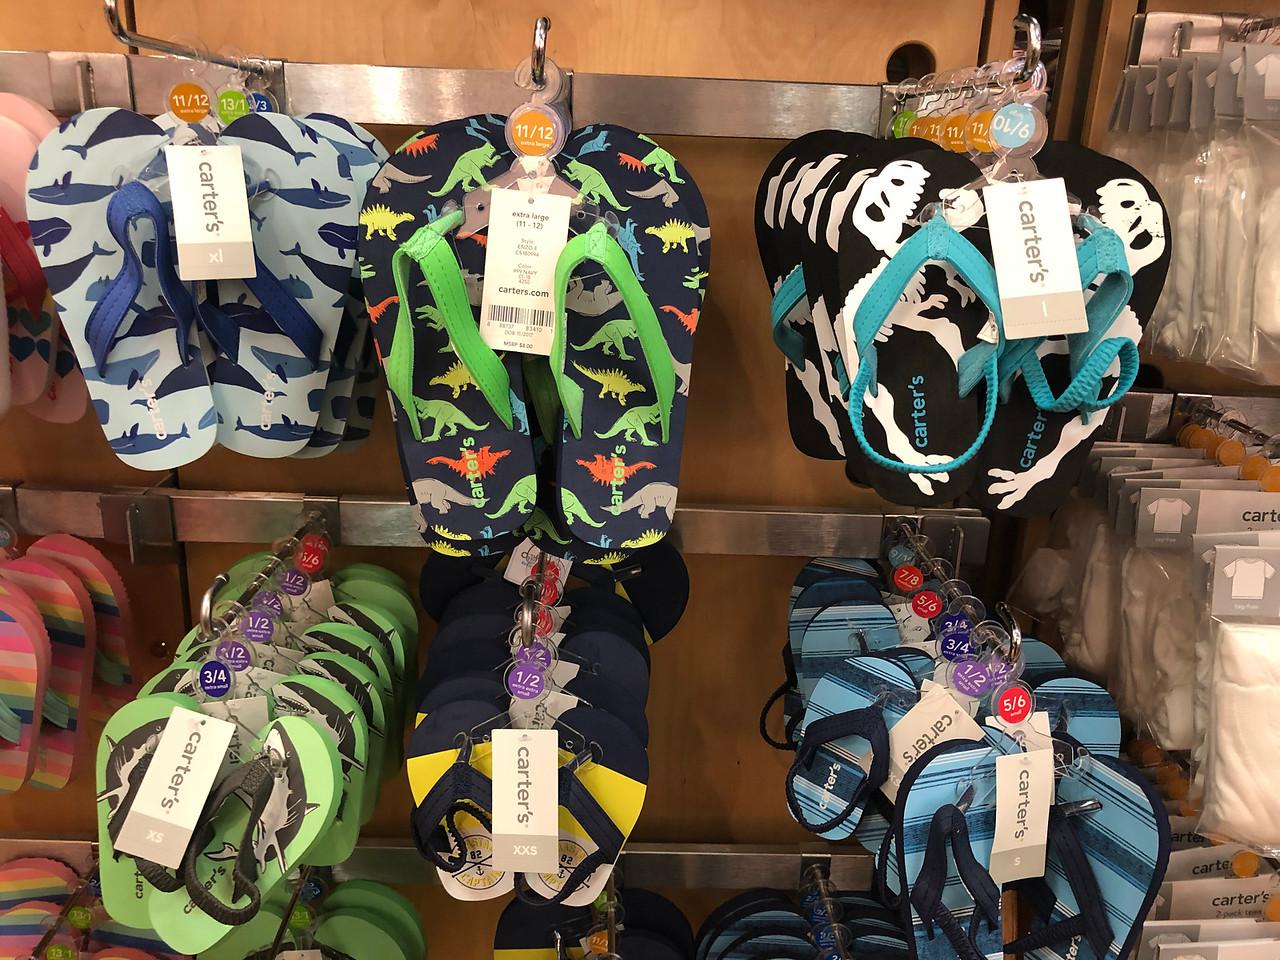 carter's kids flip flops on display at store